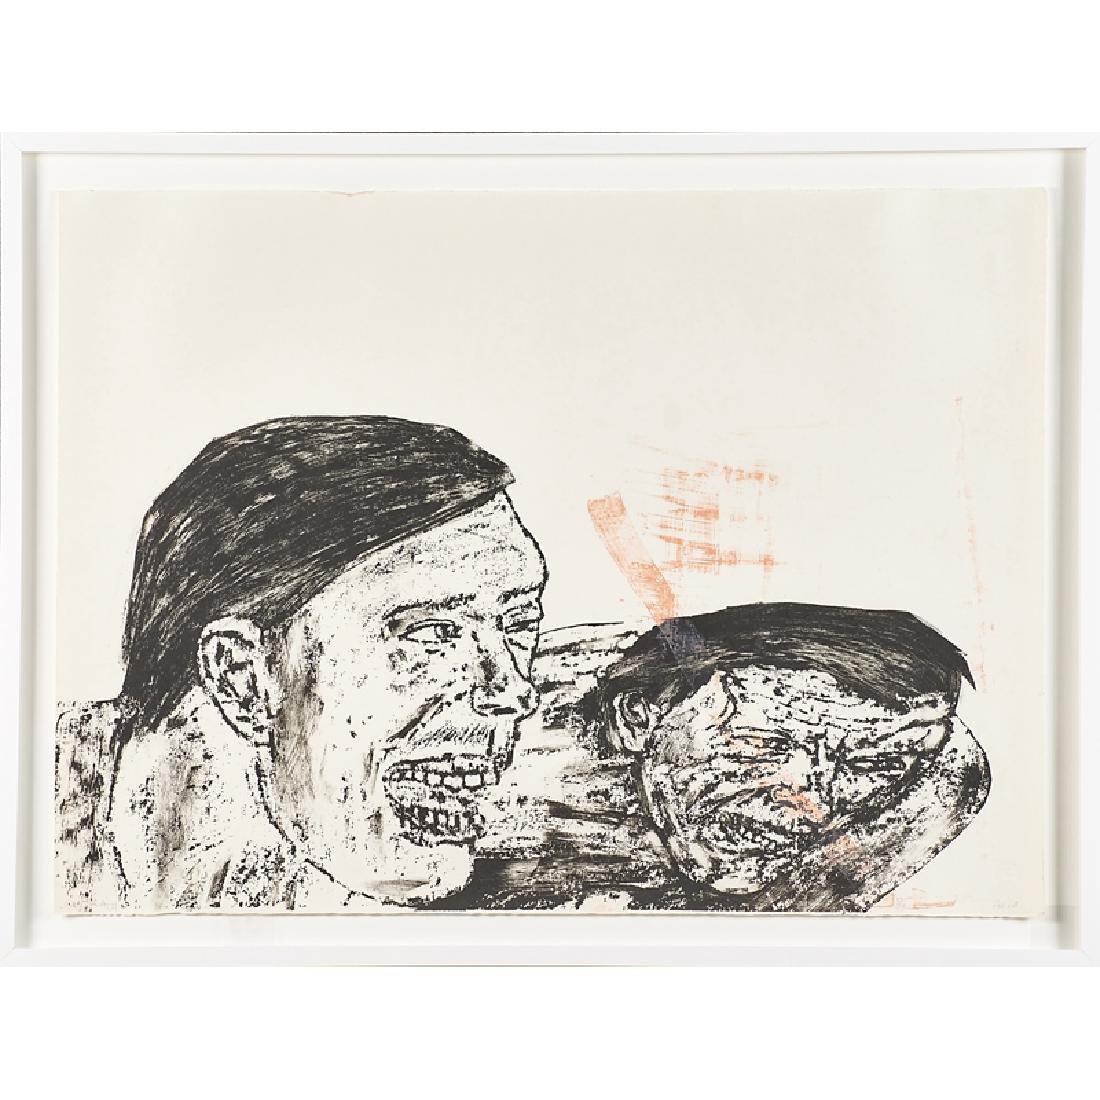 LEON GOLUB (American, 1922-2004)